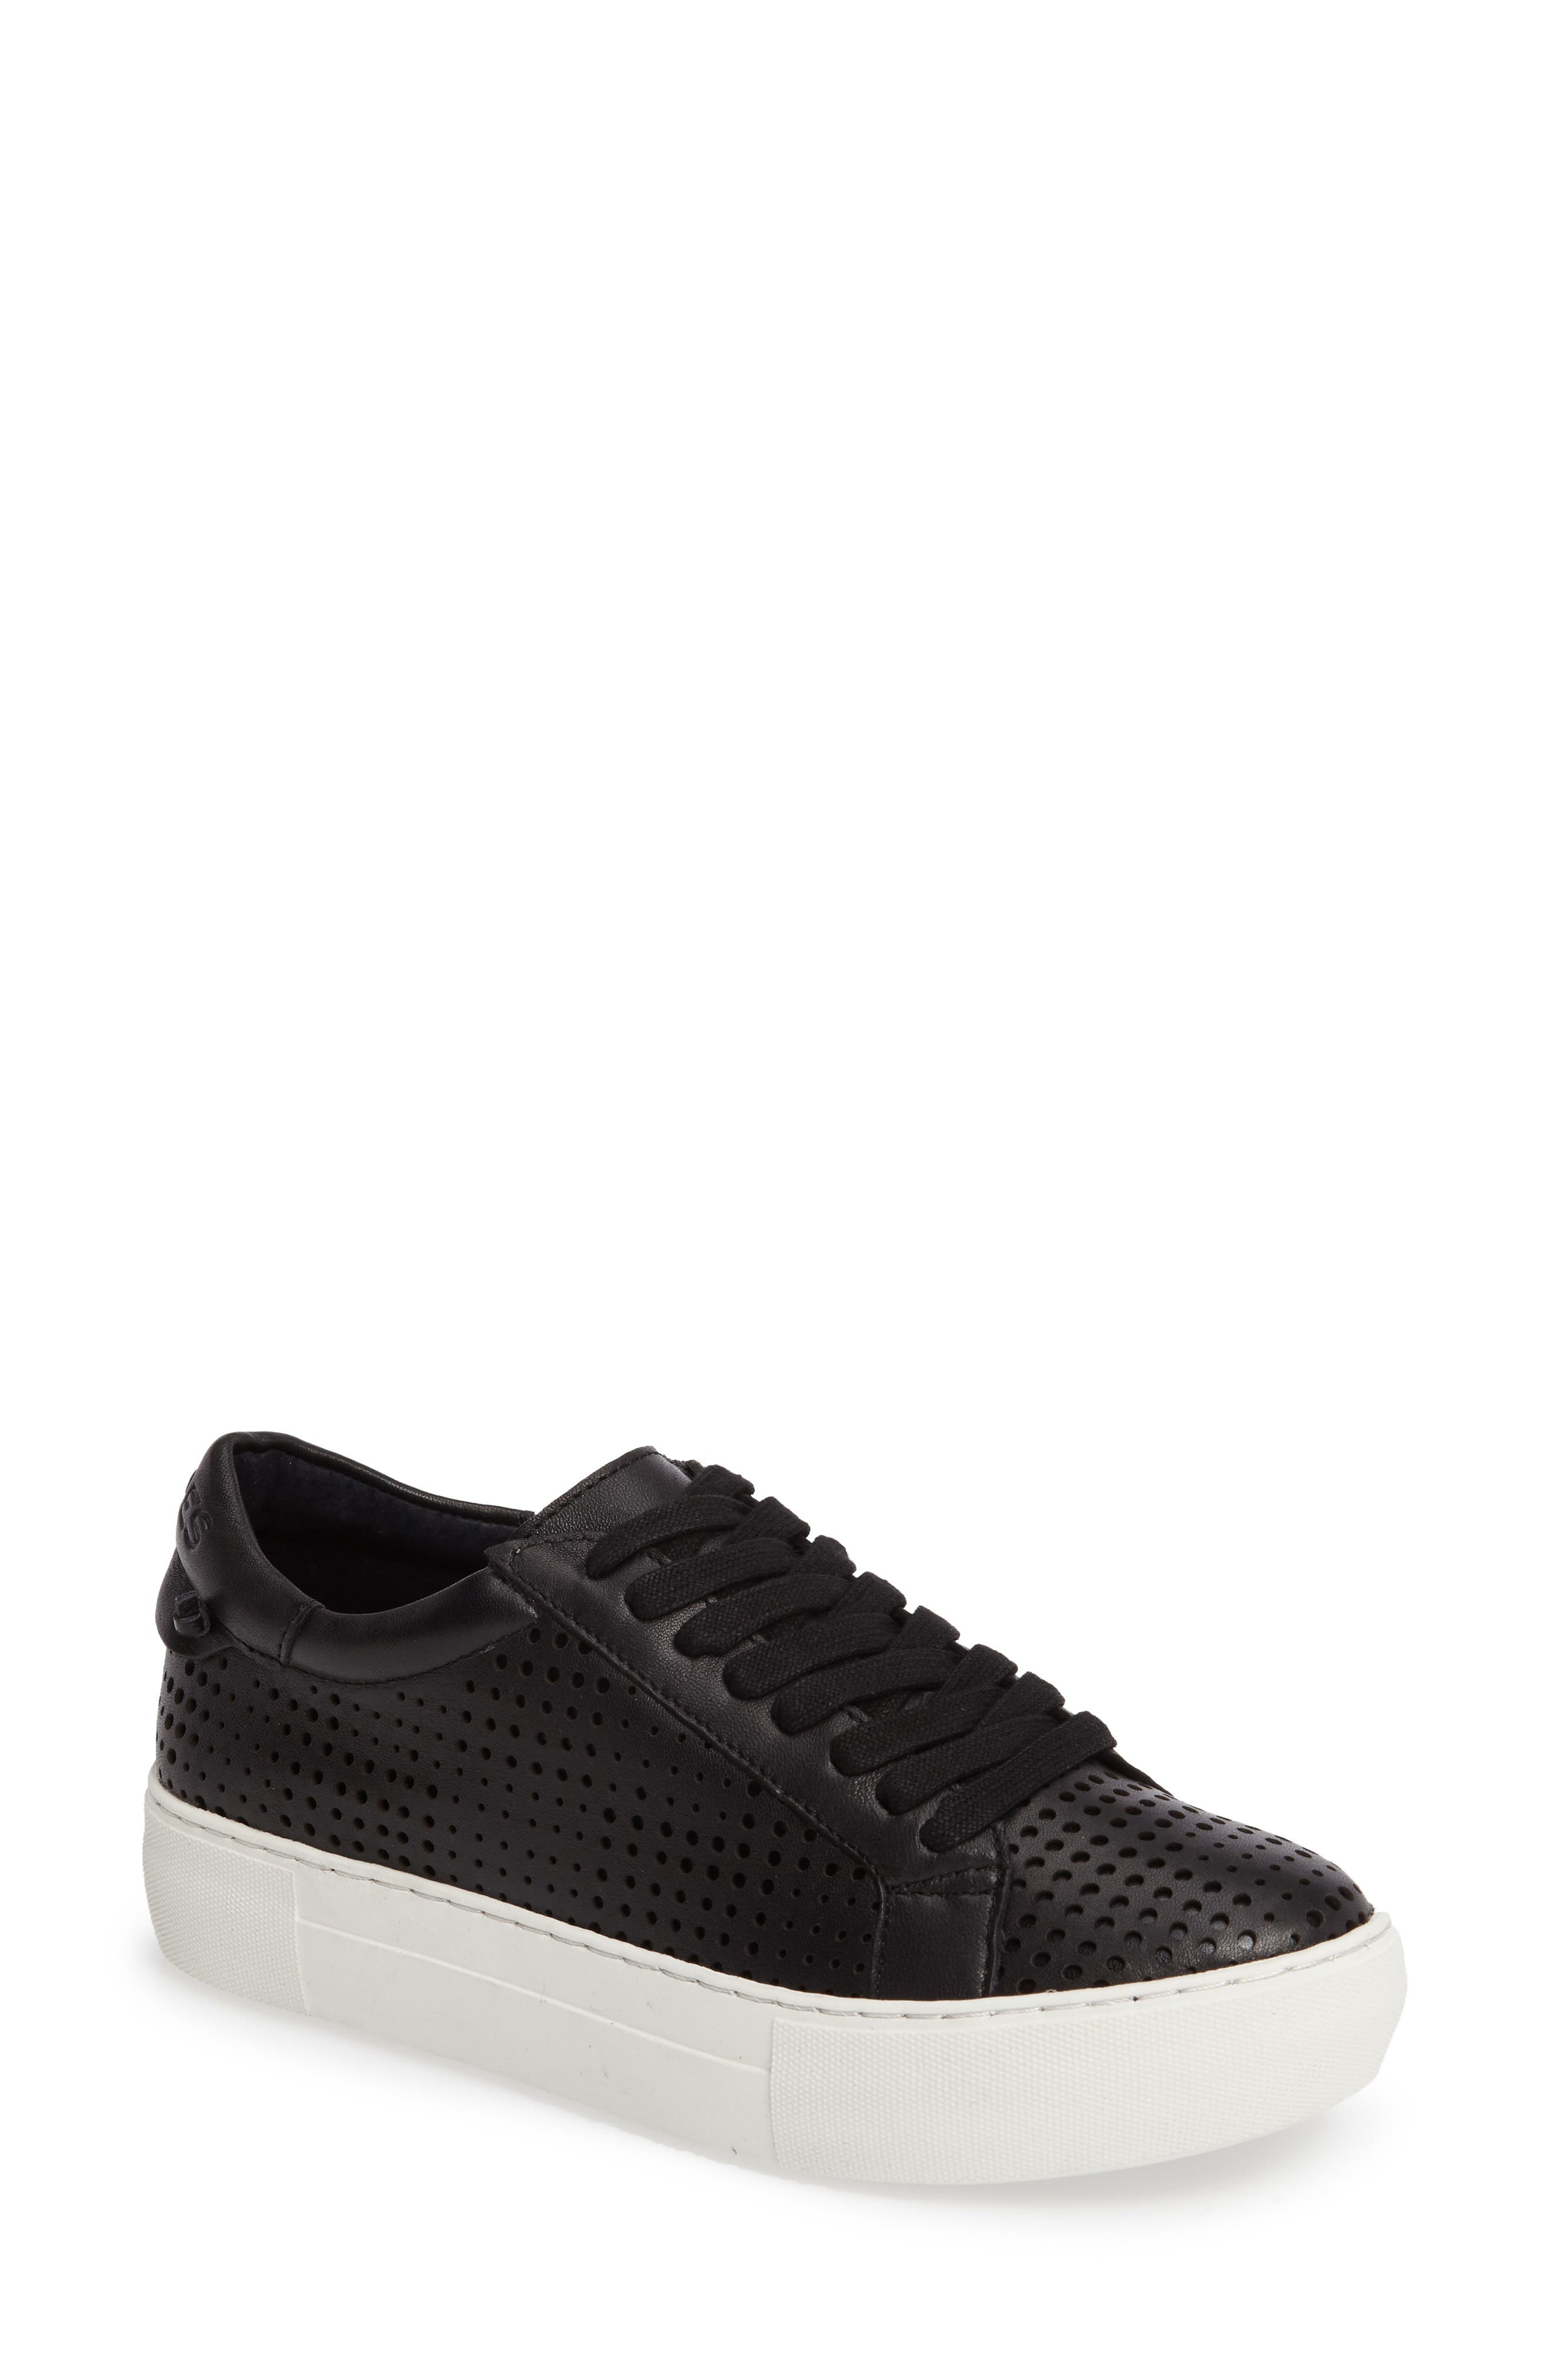 Main Image - JSlides Audrina Platform Sneaker (Women)